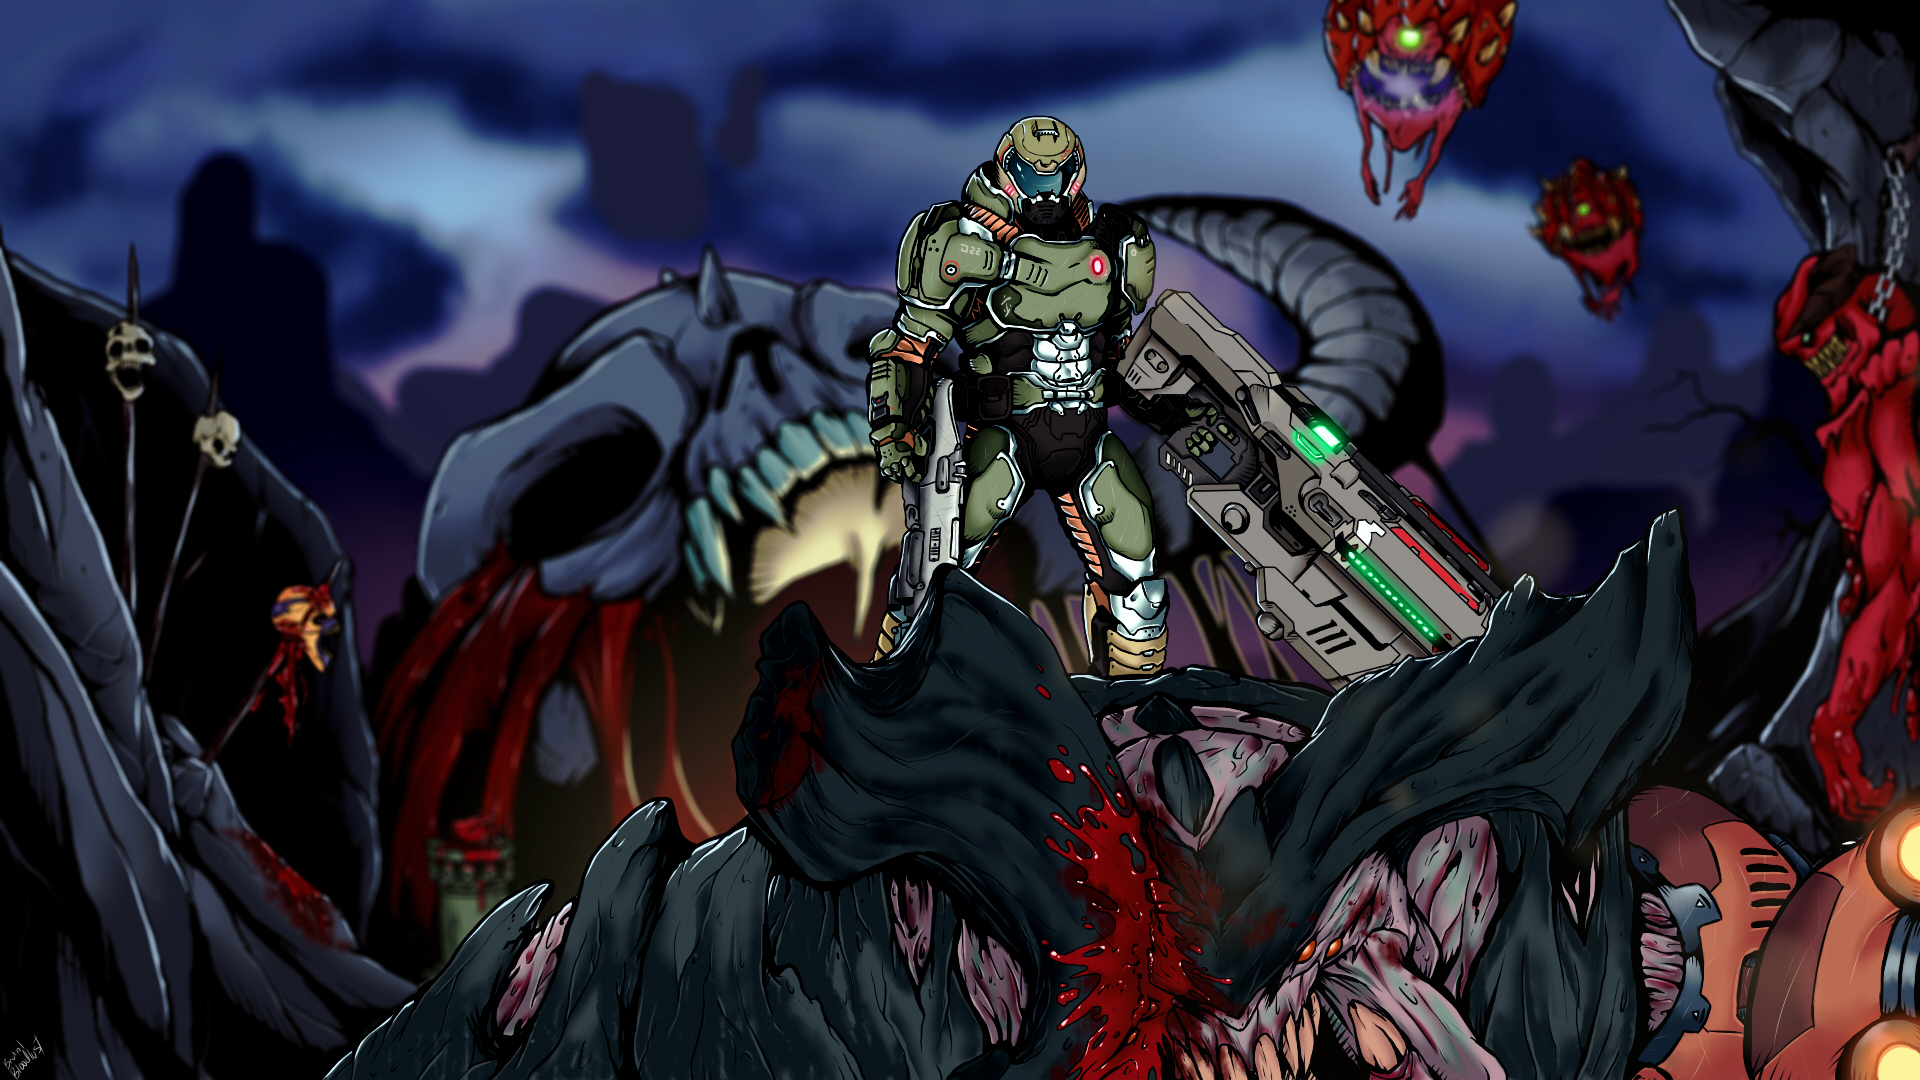 Doom 2016 Wallpaper By Brutalbloodlust On Deviantart